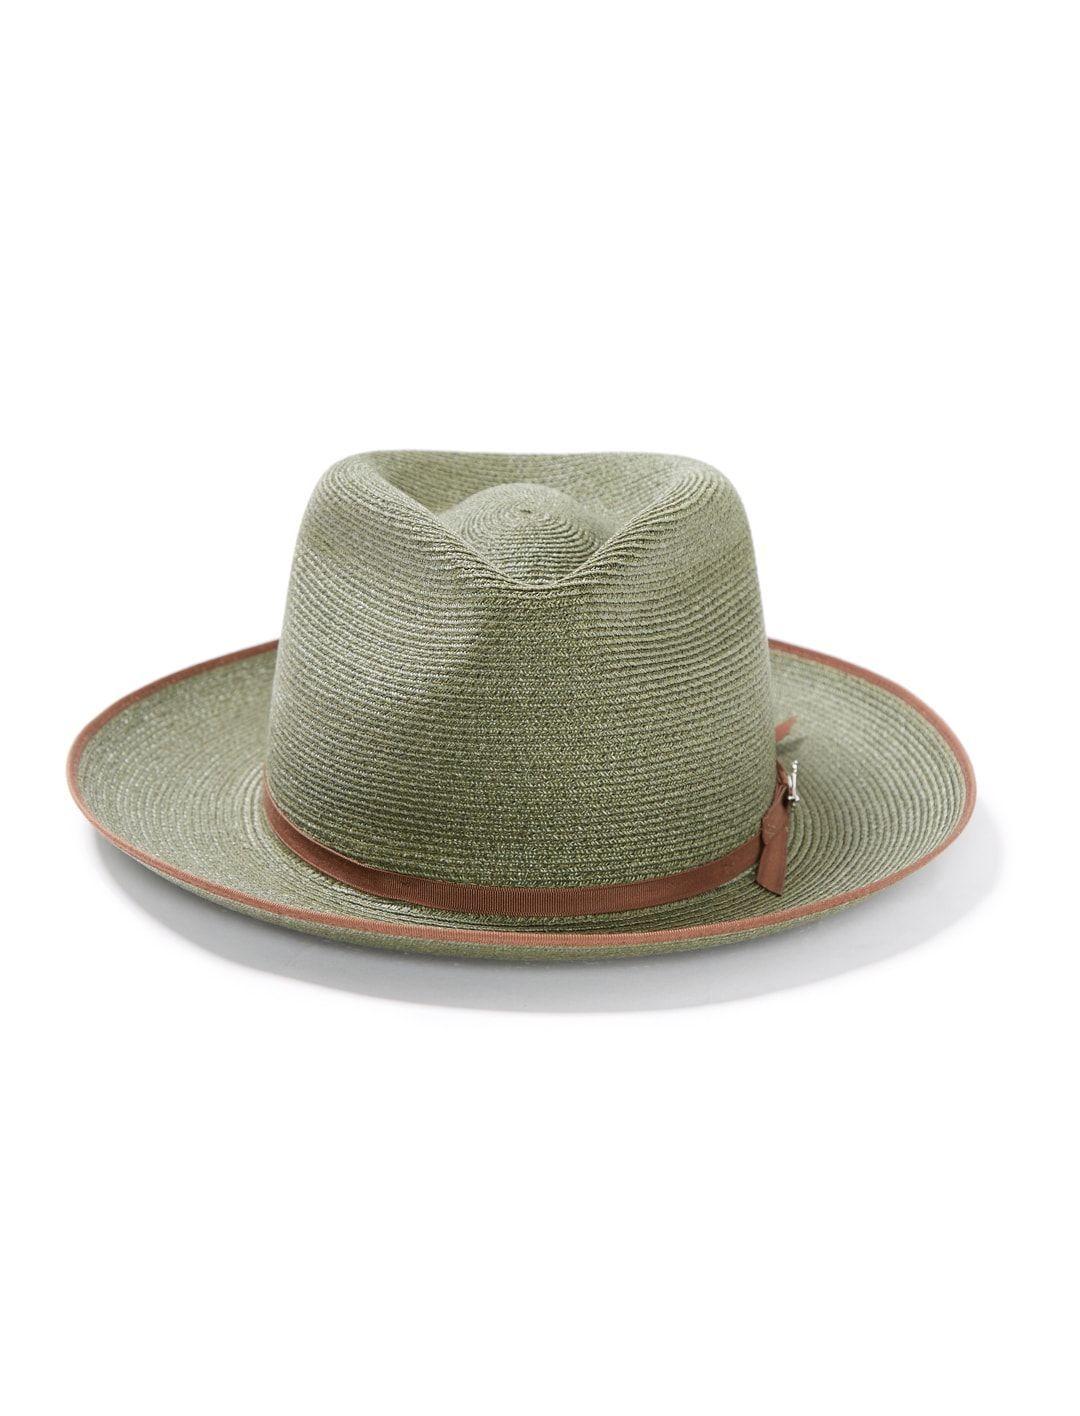 6594a98d8 Stetson Stratoliner Hemp Fedora   Stylish Accessories   Felt cowboy ...